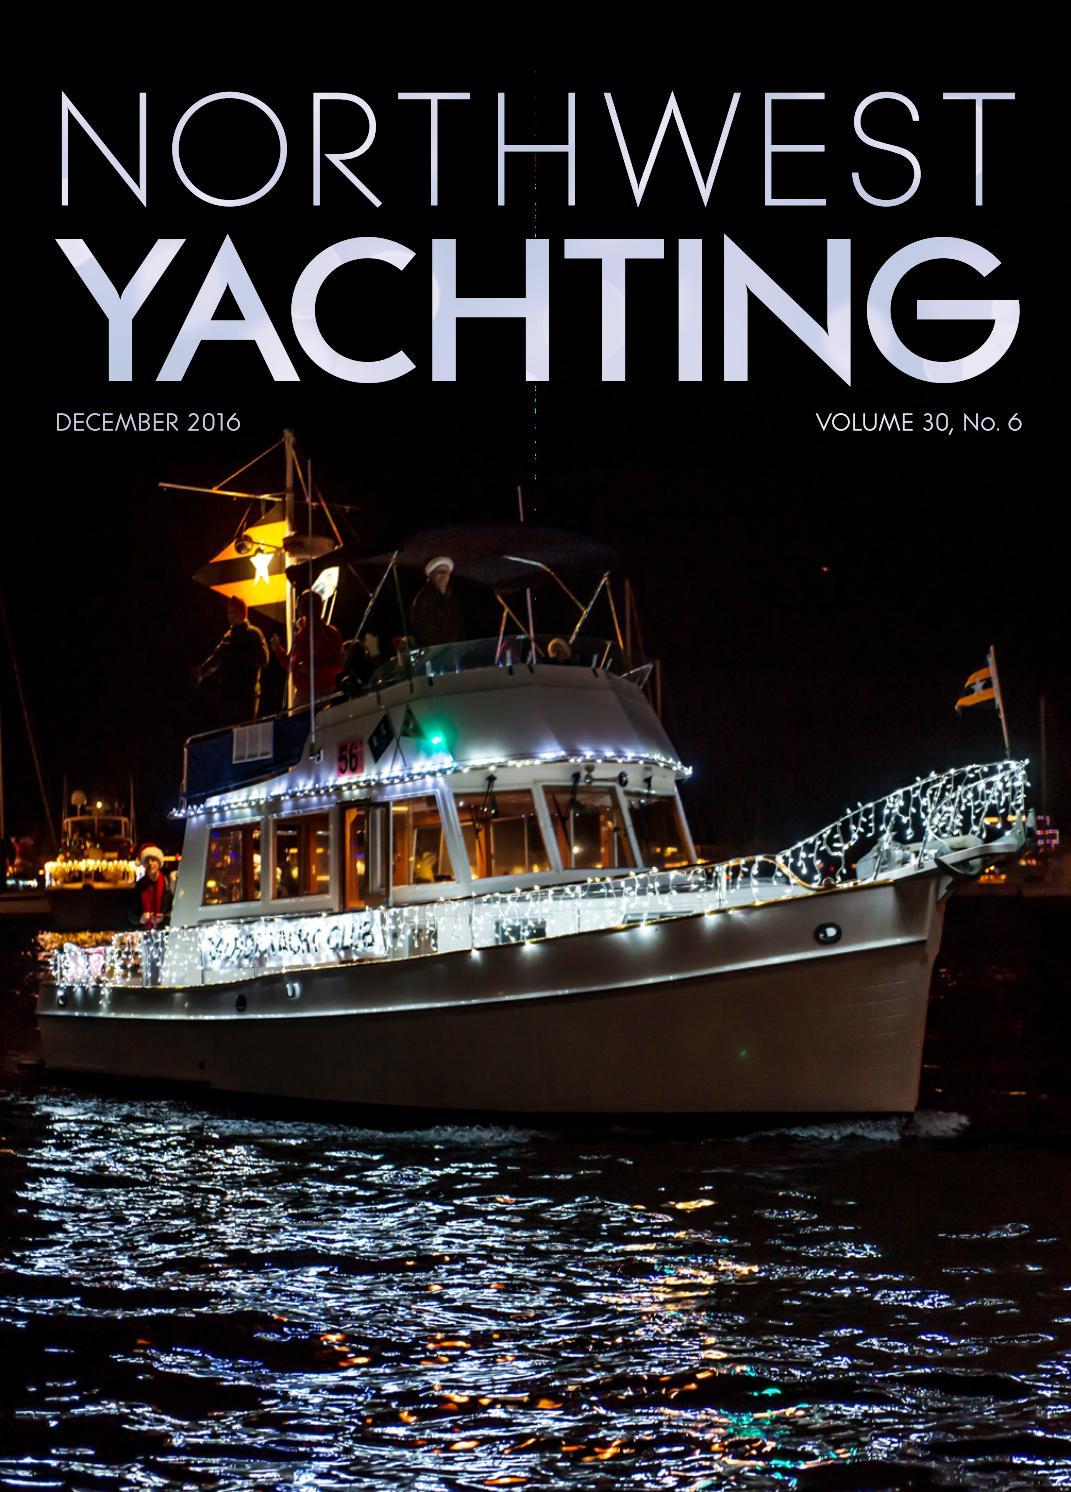 Northwest Yachting December 2016 By Issuu Shuttle Agate Black